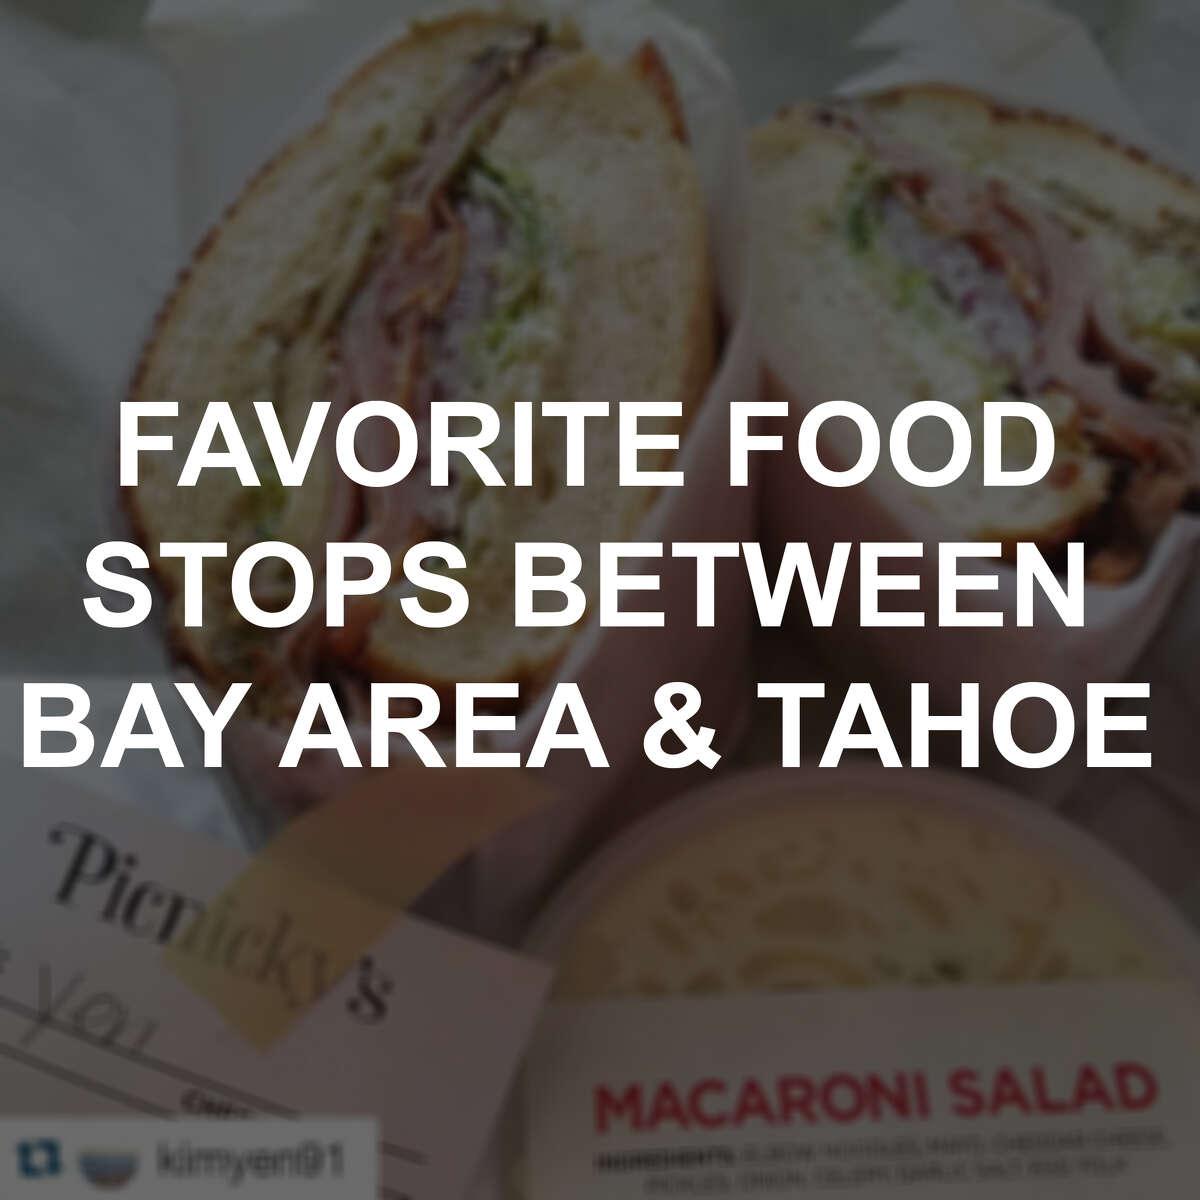 Favorite food stops between the Bay Area and Tahoe